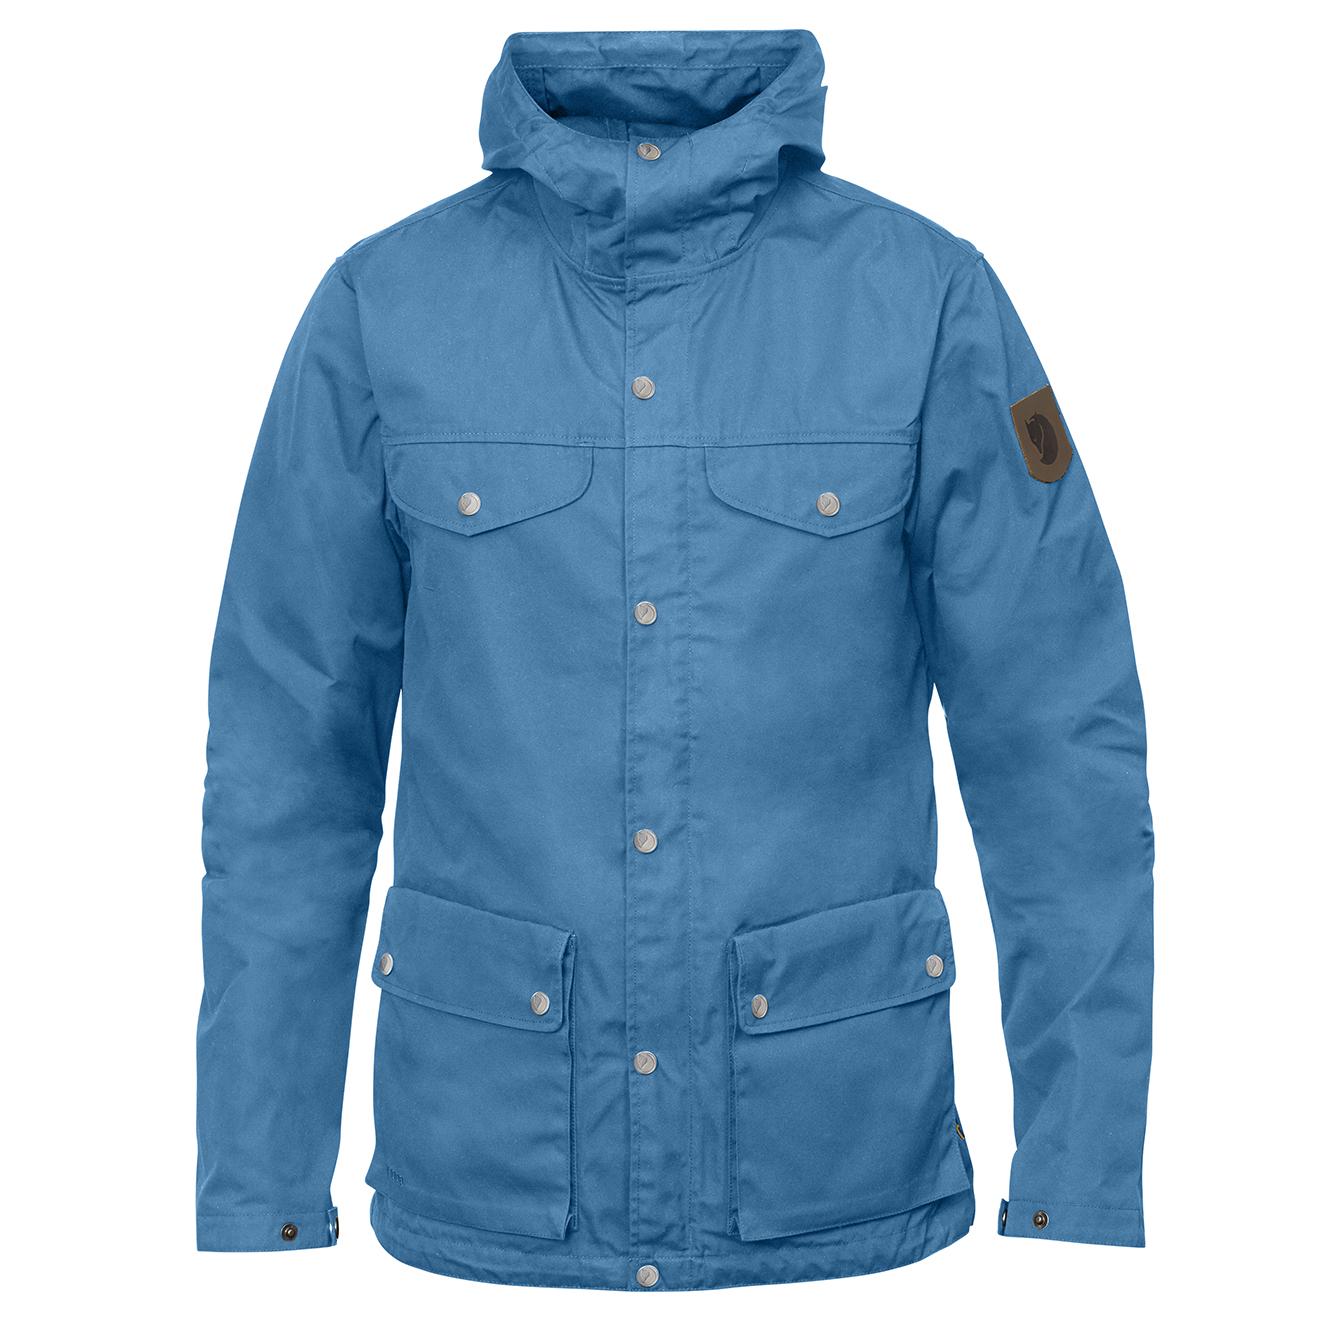 online store 1726e bc790 Fjallraven Greenland Jacket Azure Blue